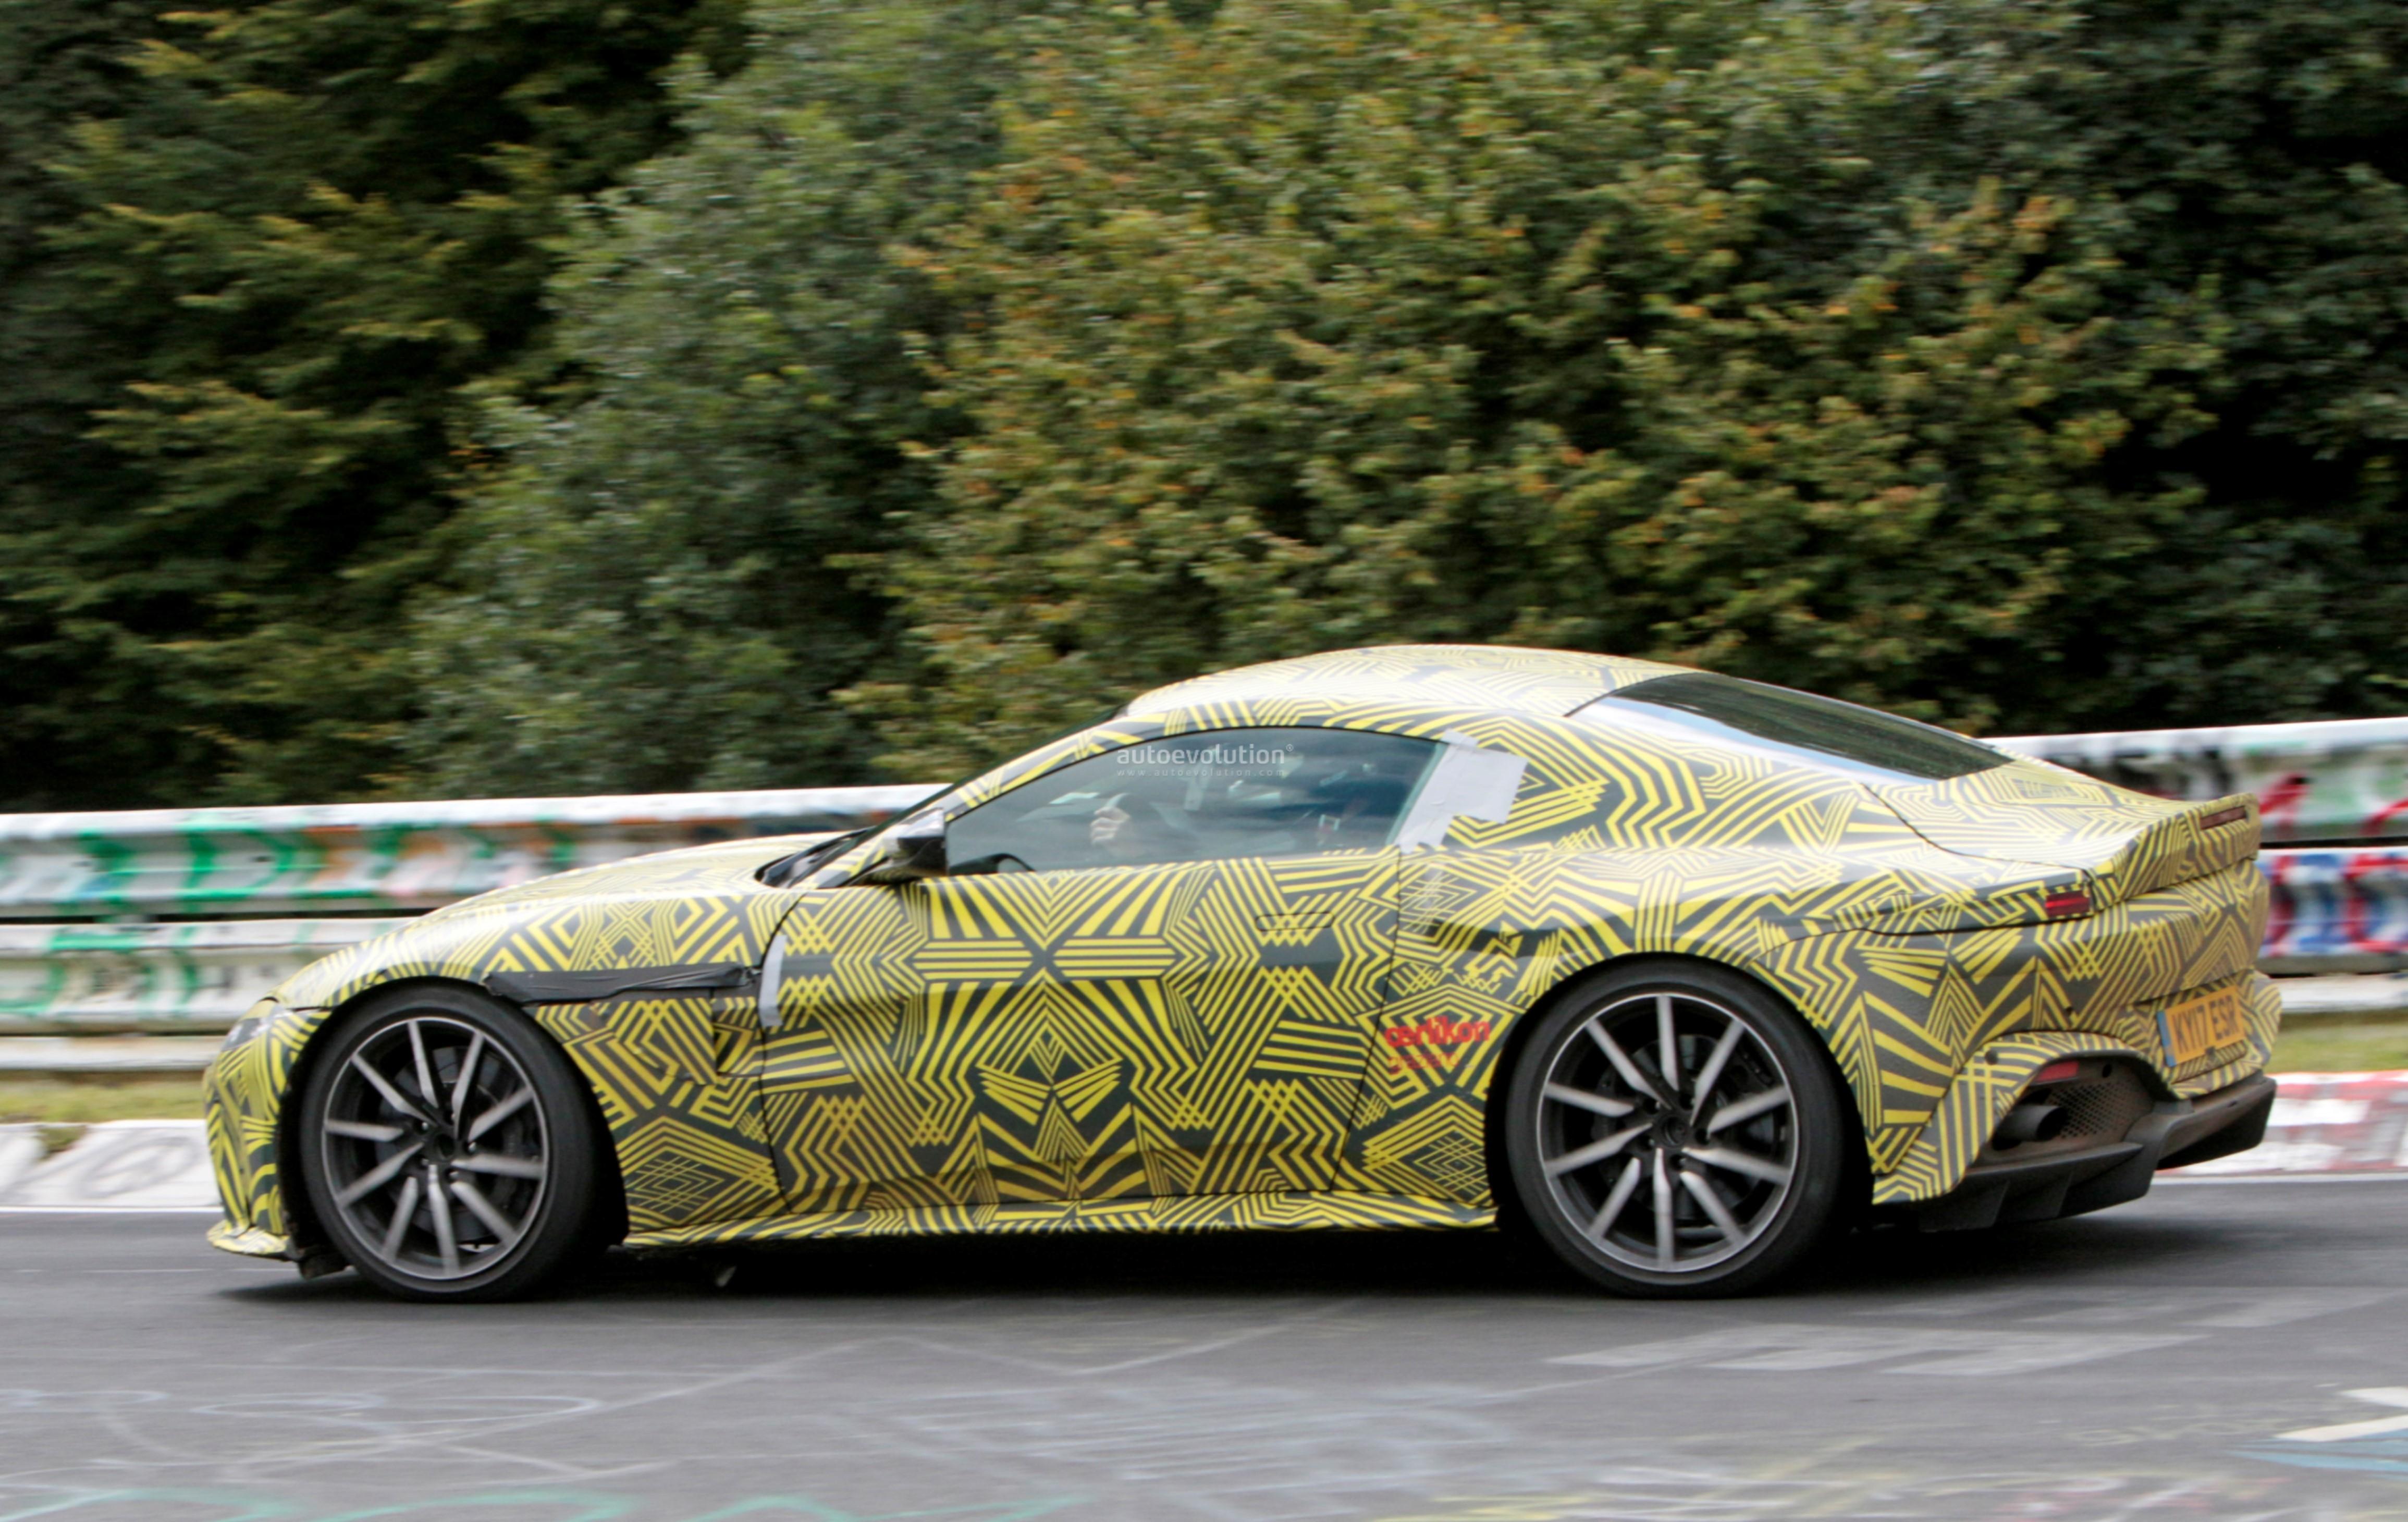 2019 Aston Martin V8 Vantage Driven Hard On The Nurburgring In